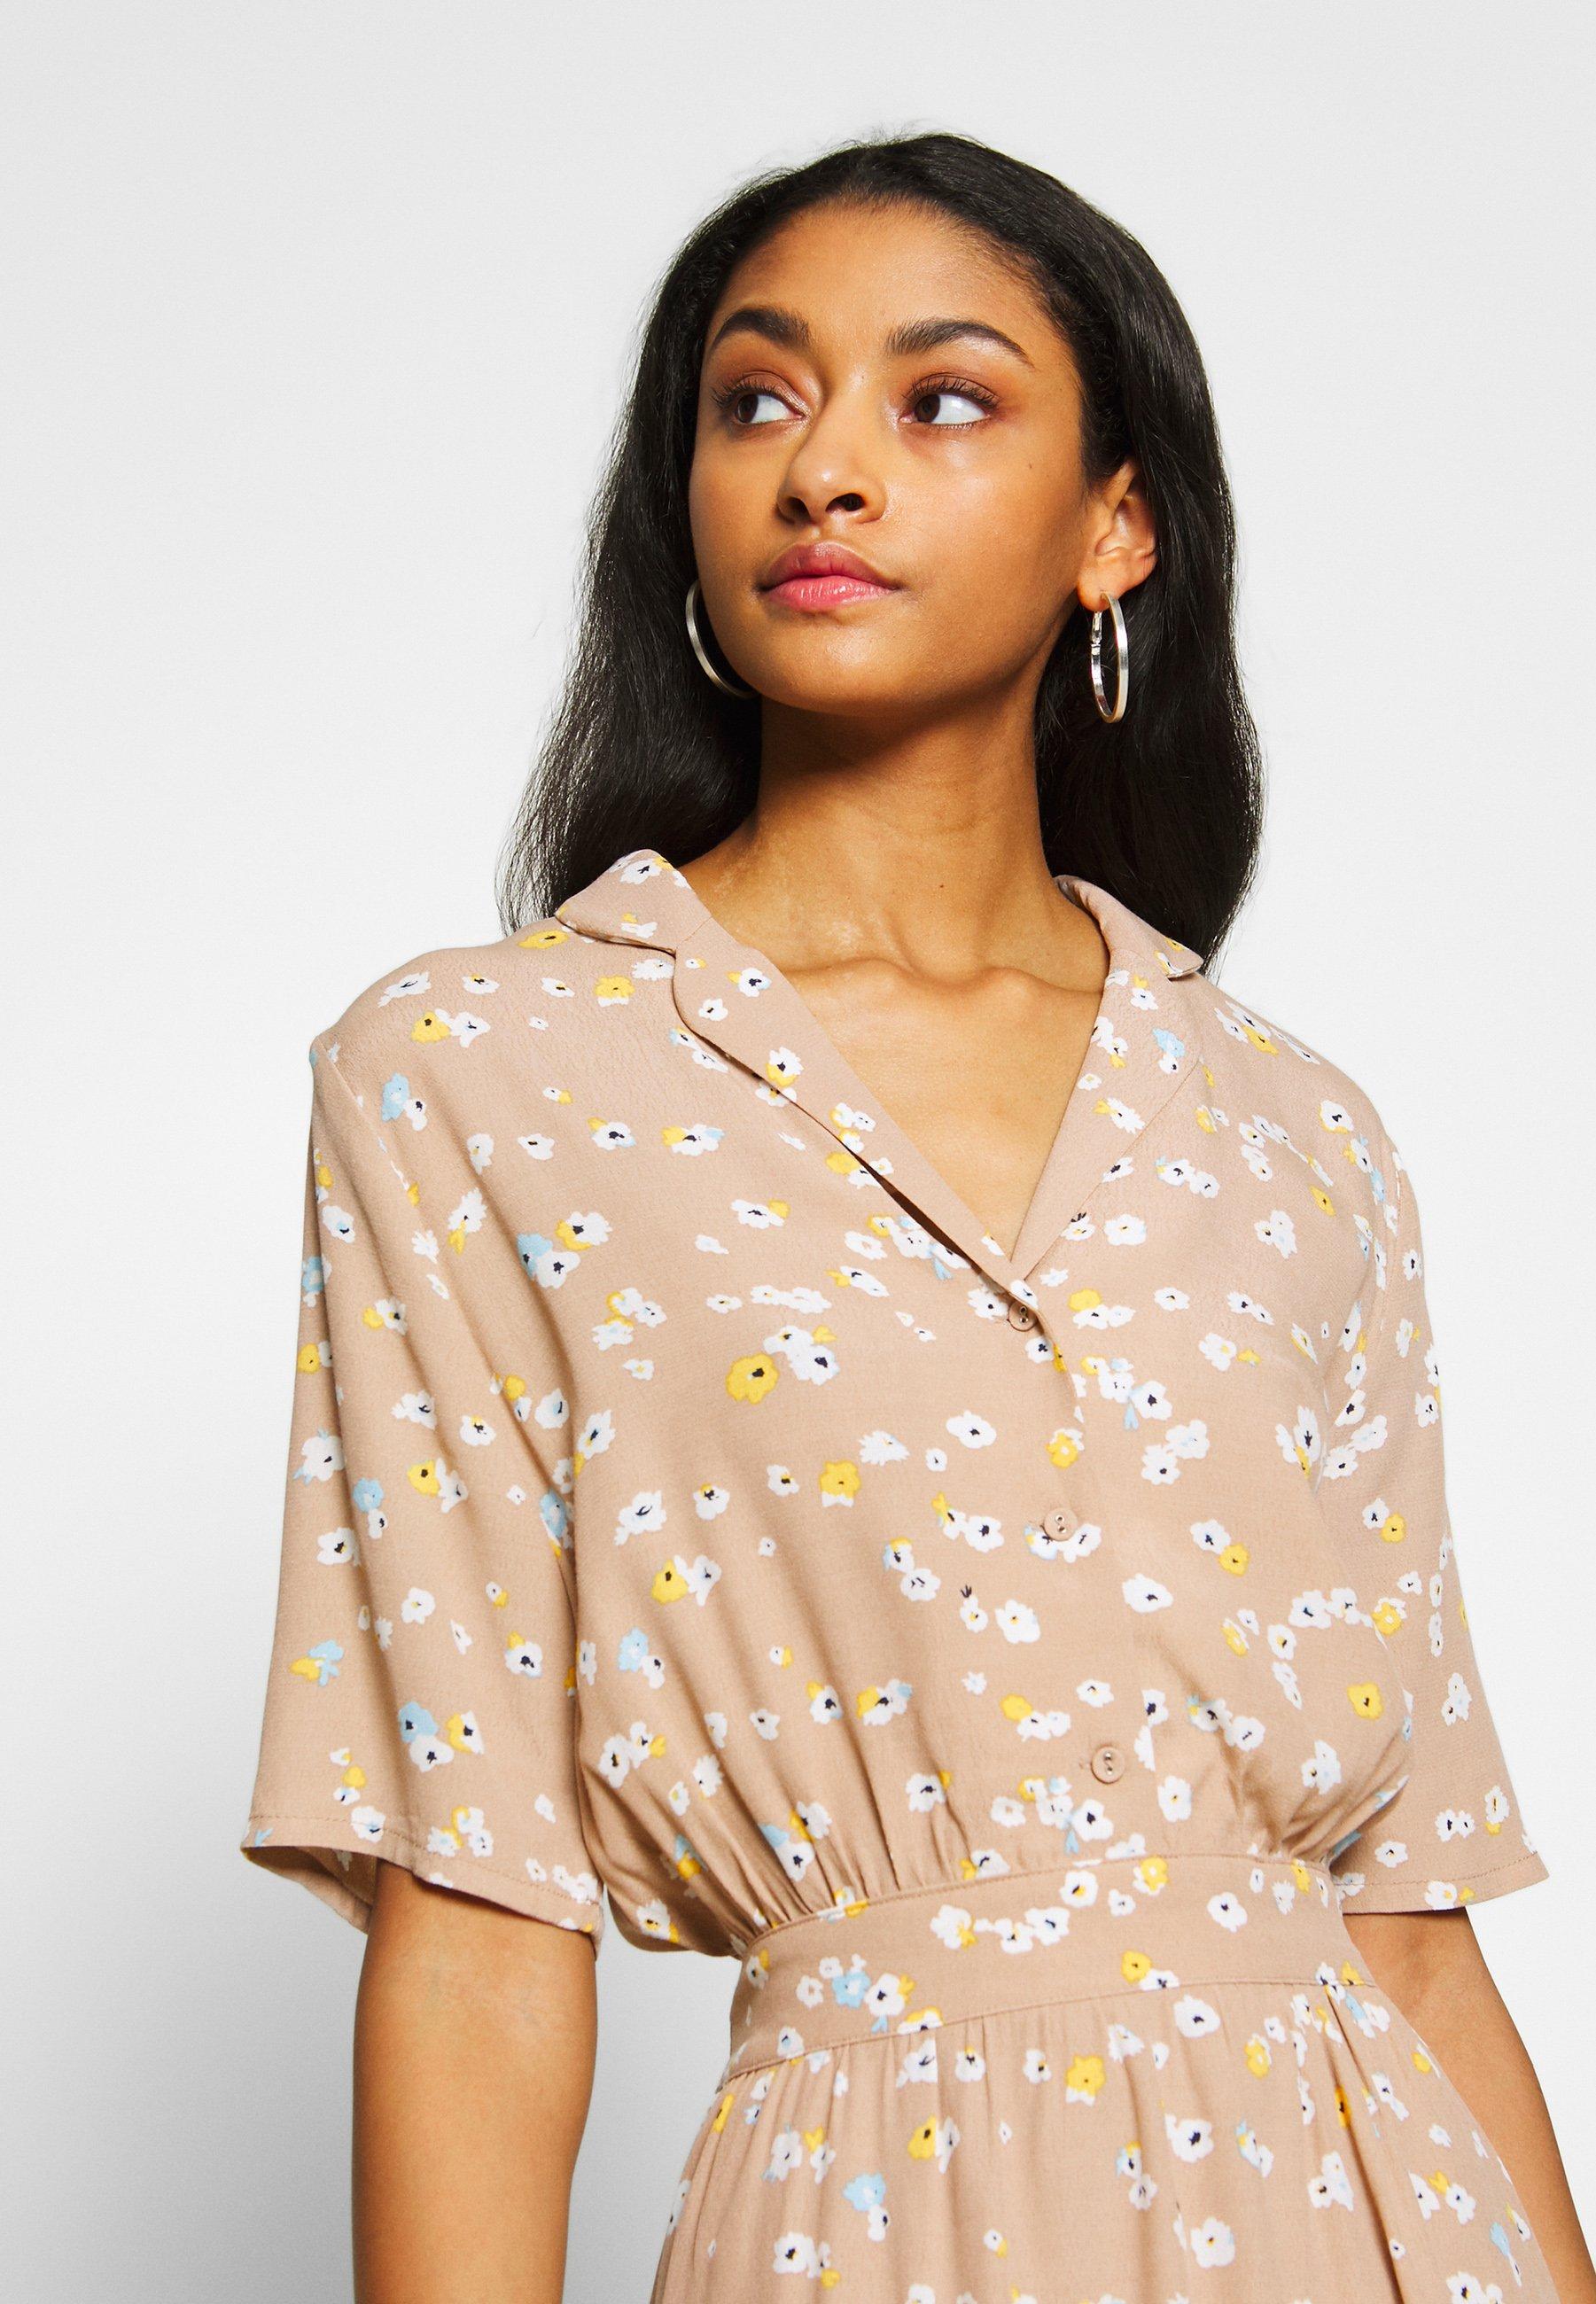 ICHI IHANGEL - Blusenkleid - natural | Damenbekleidung 2020